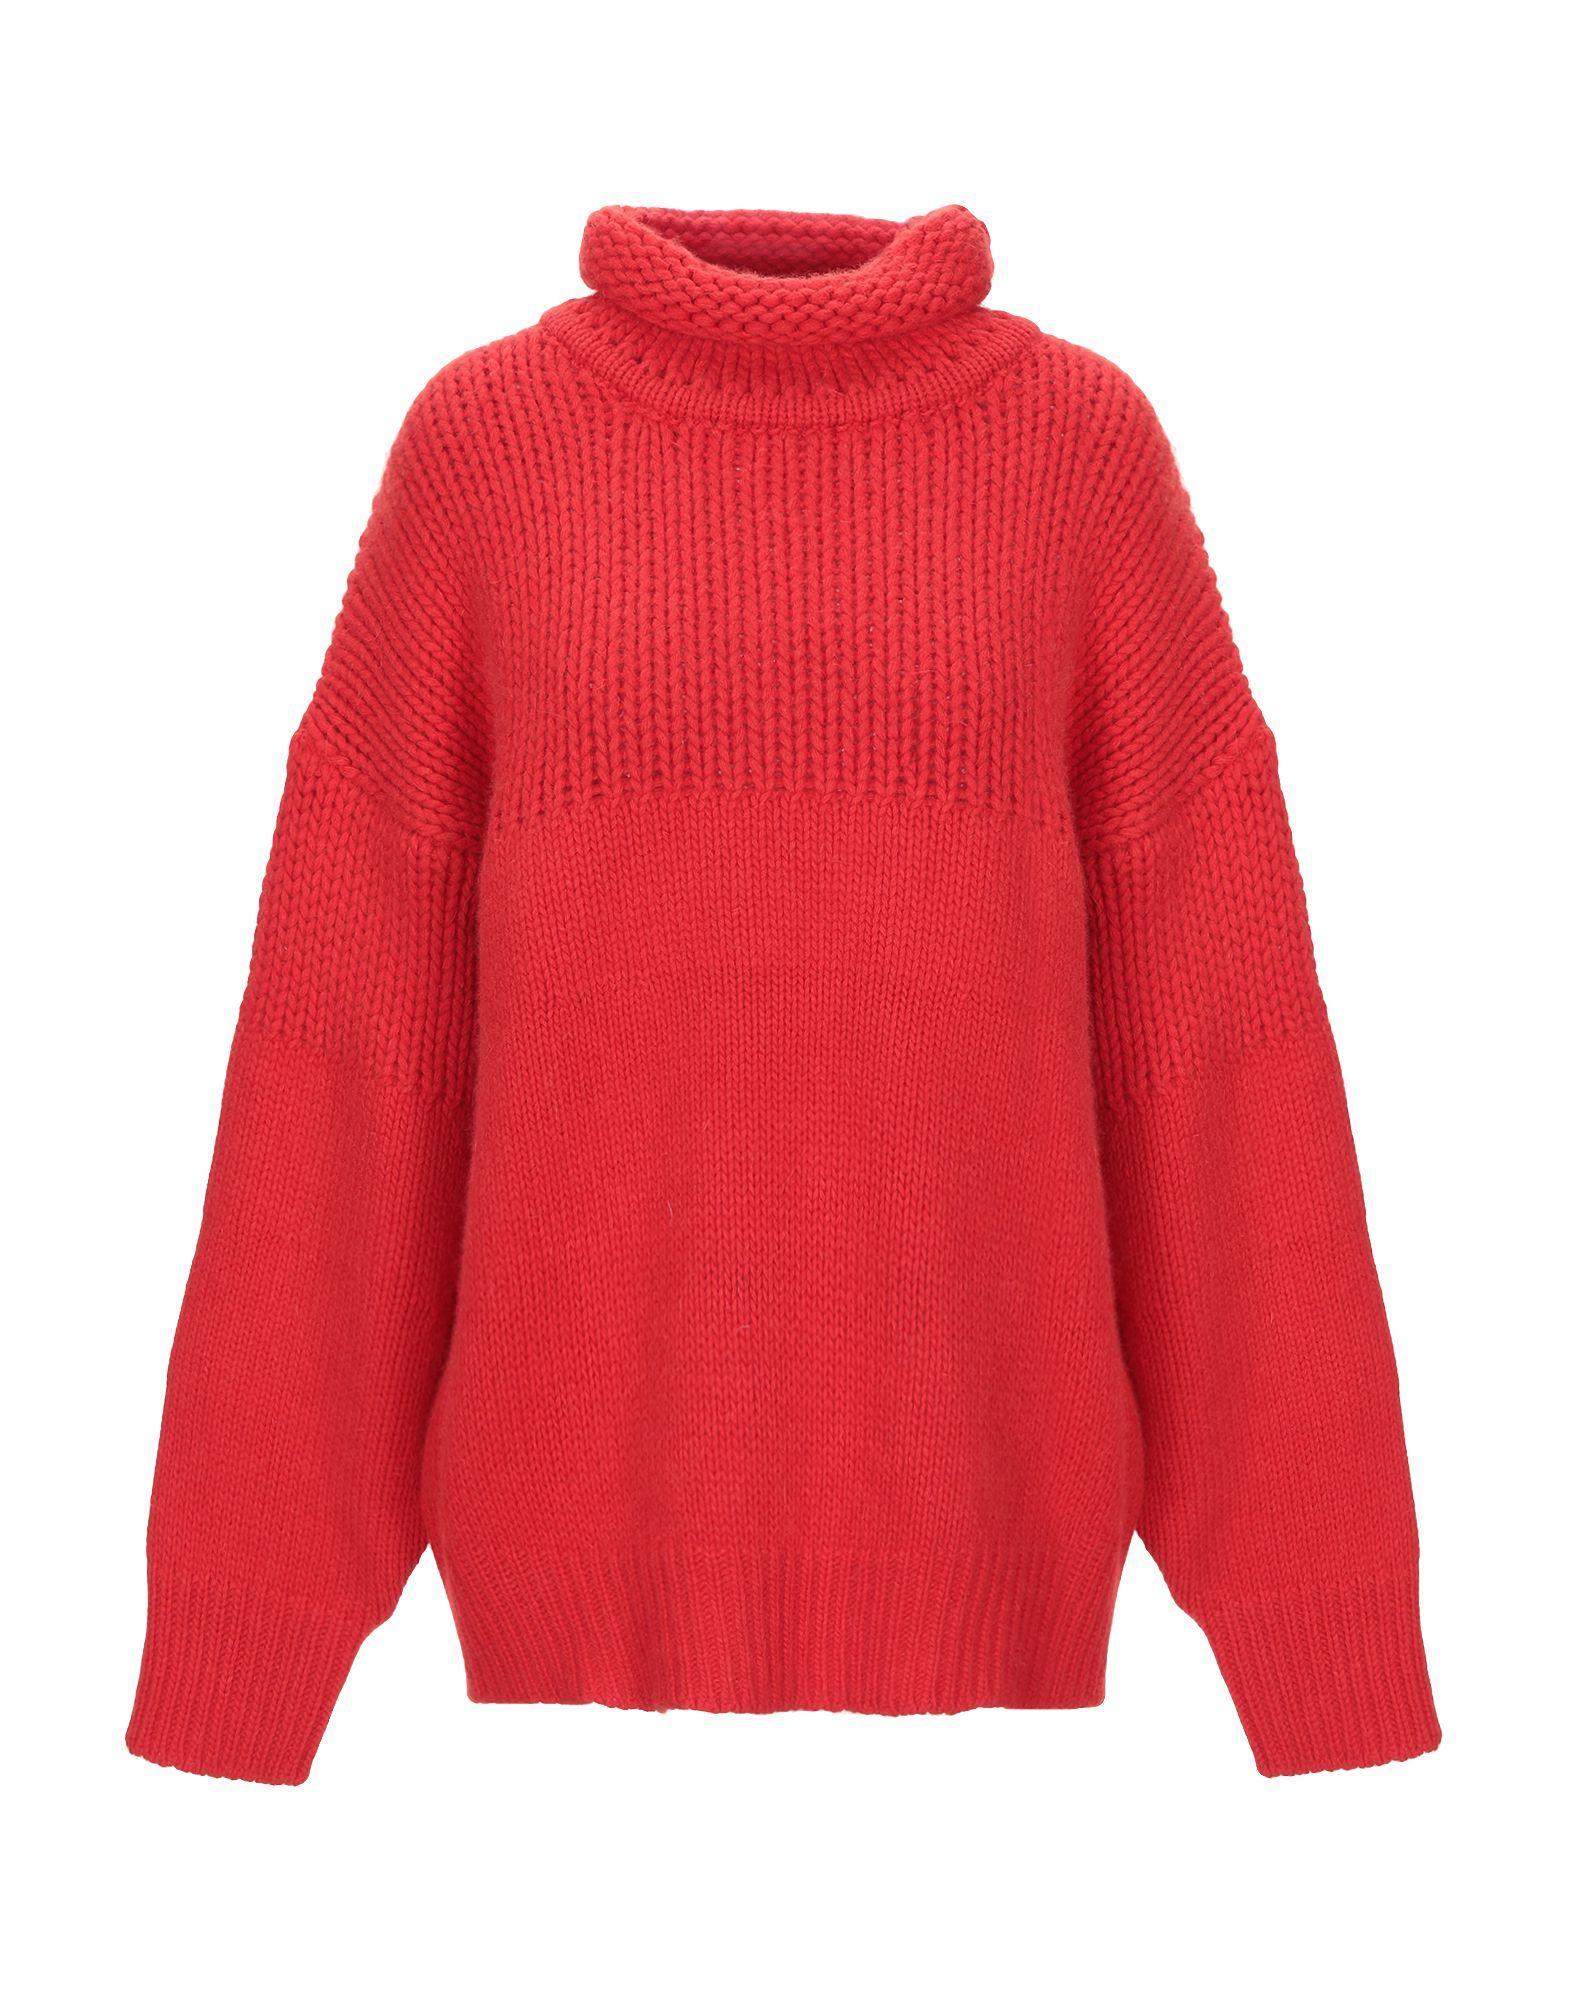 Jil Sander Red Virgin Wool Knit Jumper